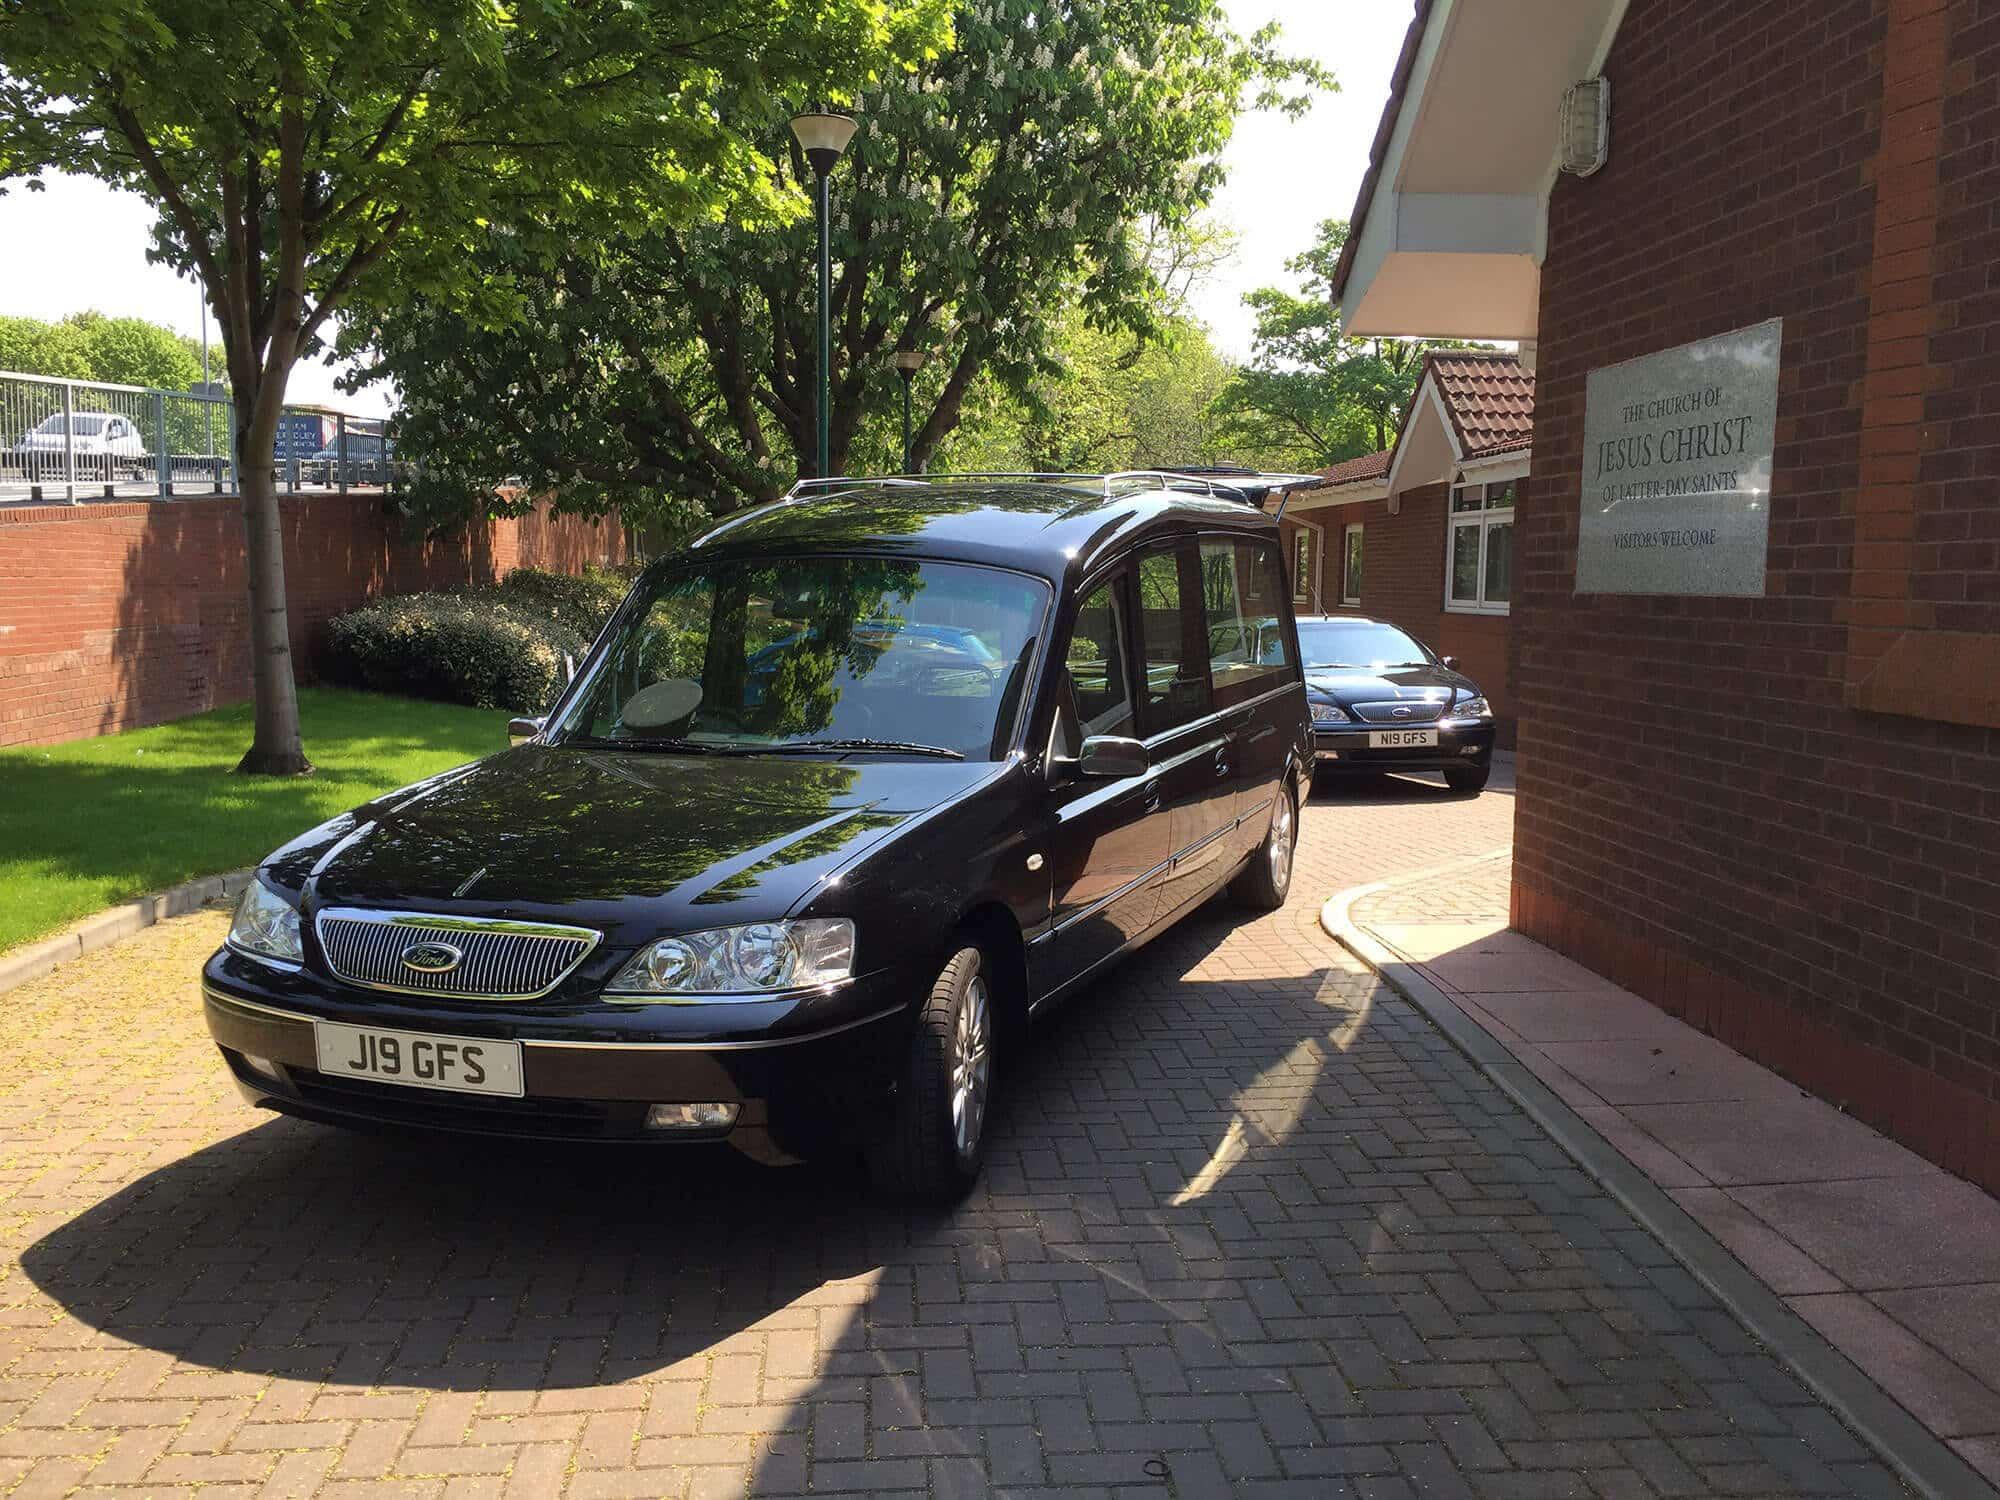 Standard hearse